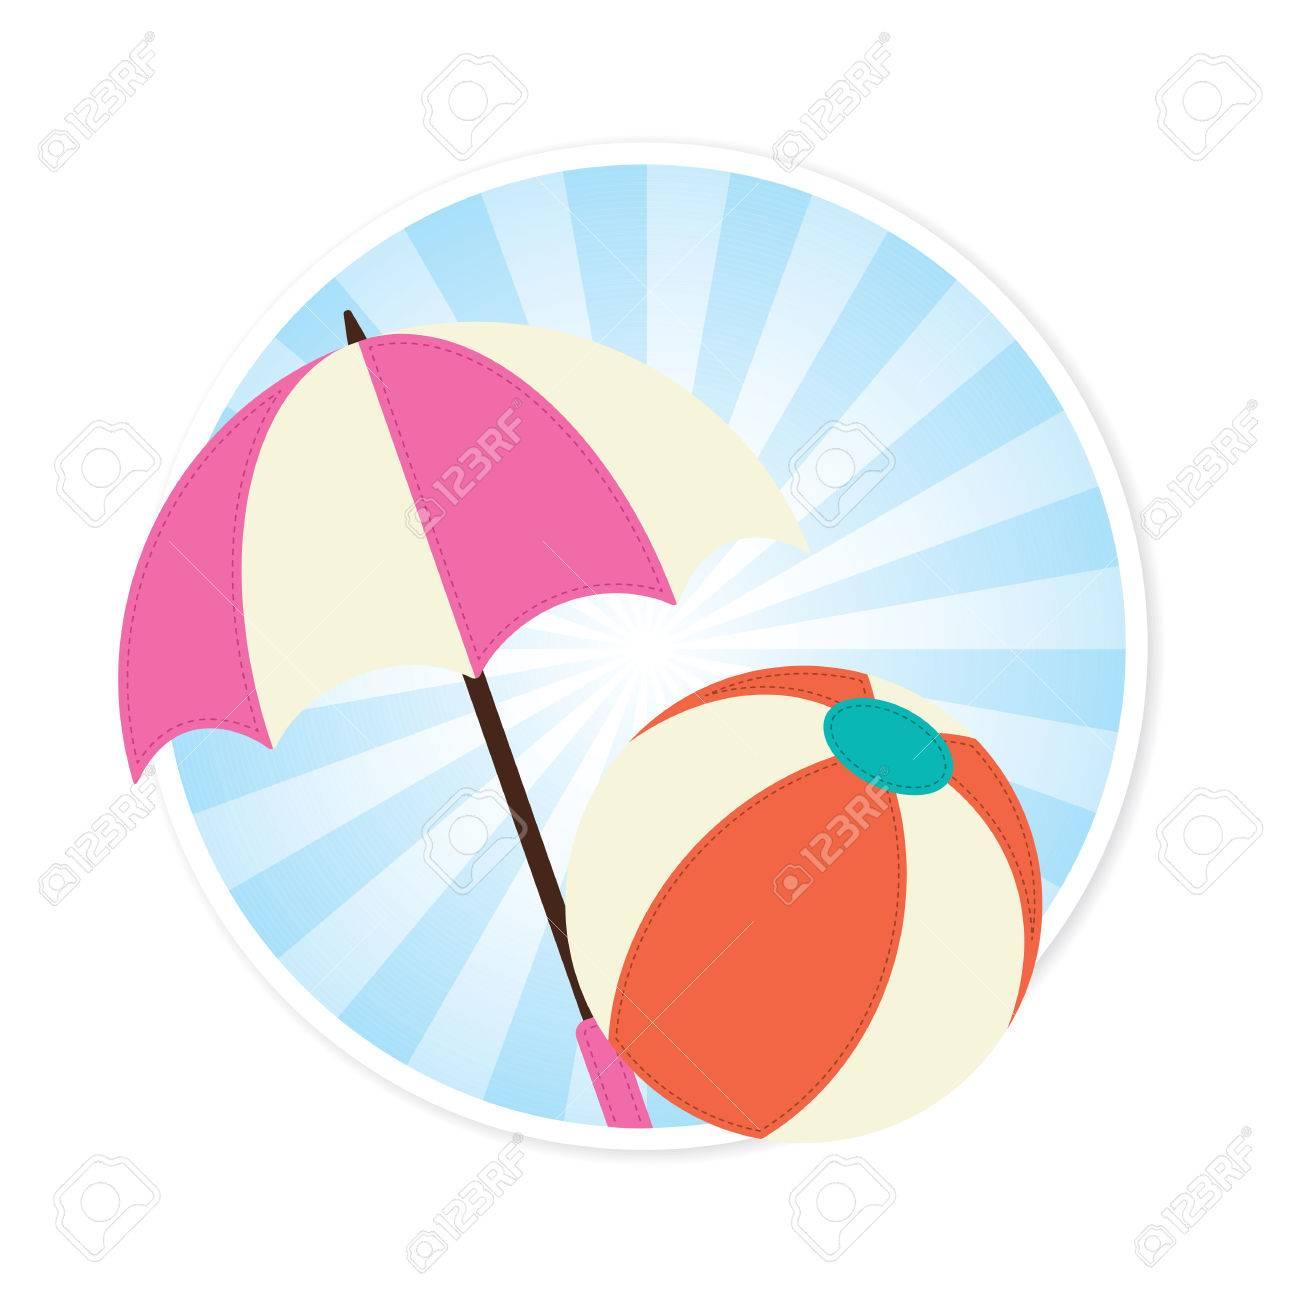 Beach Ball And Sun Umbrella Illustration Royalty Free Cliparts